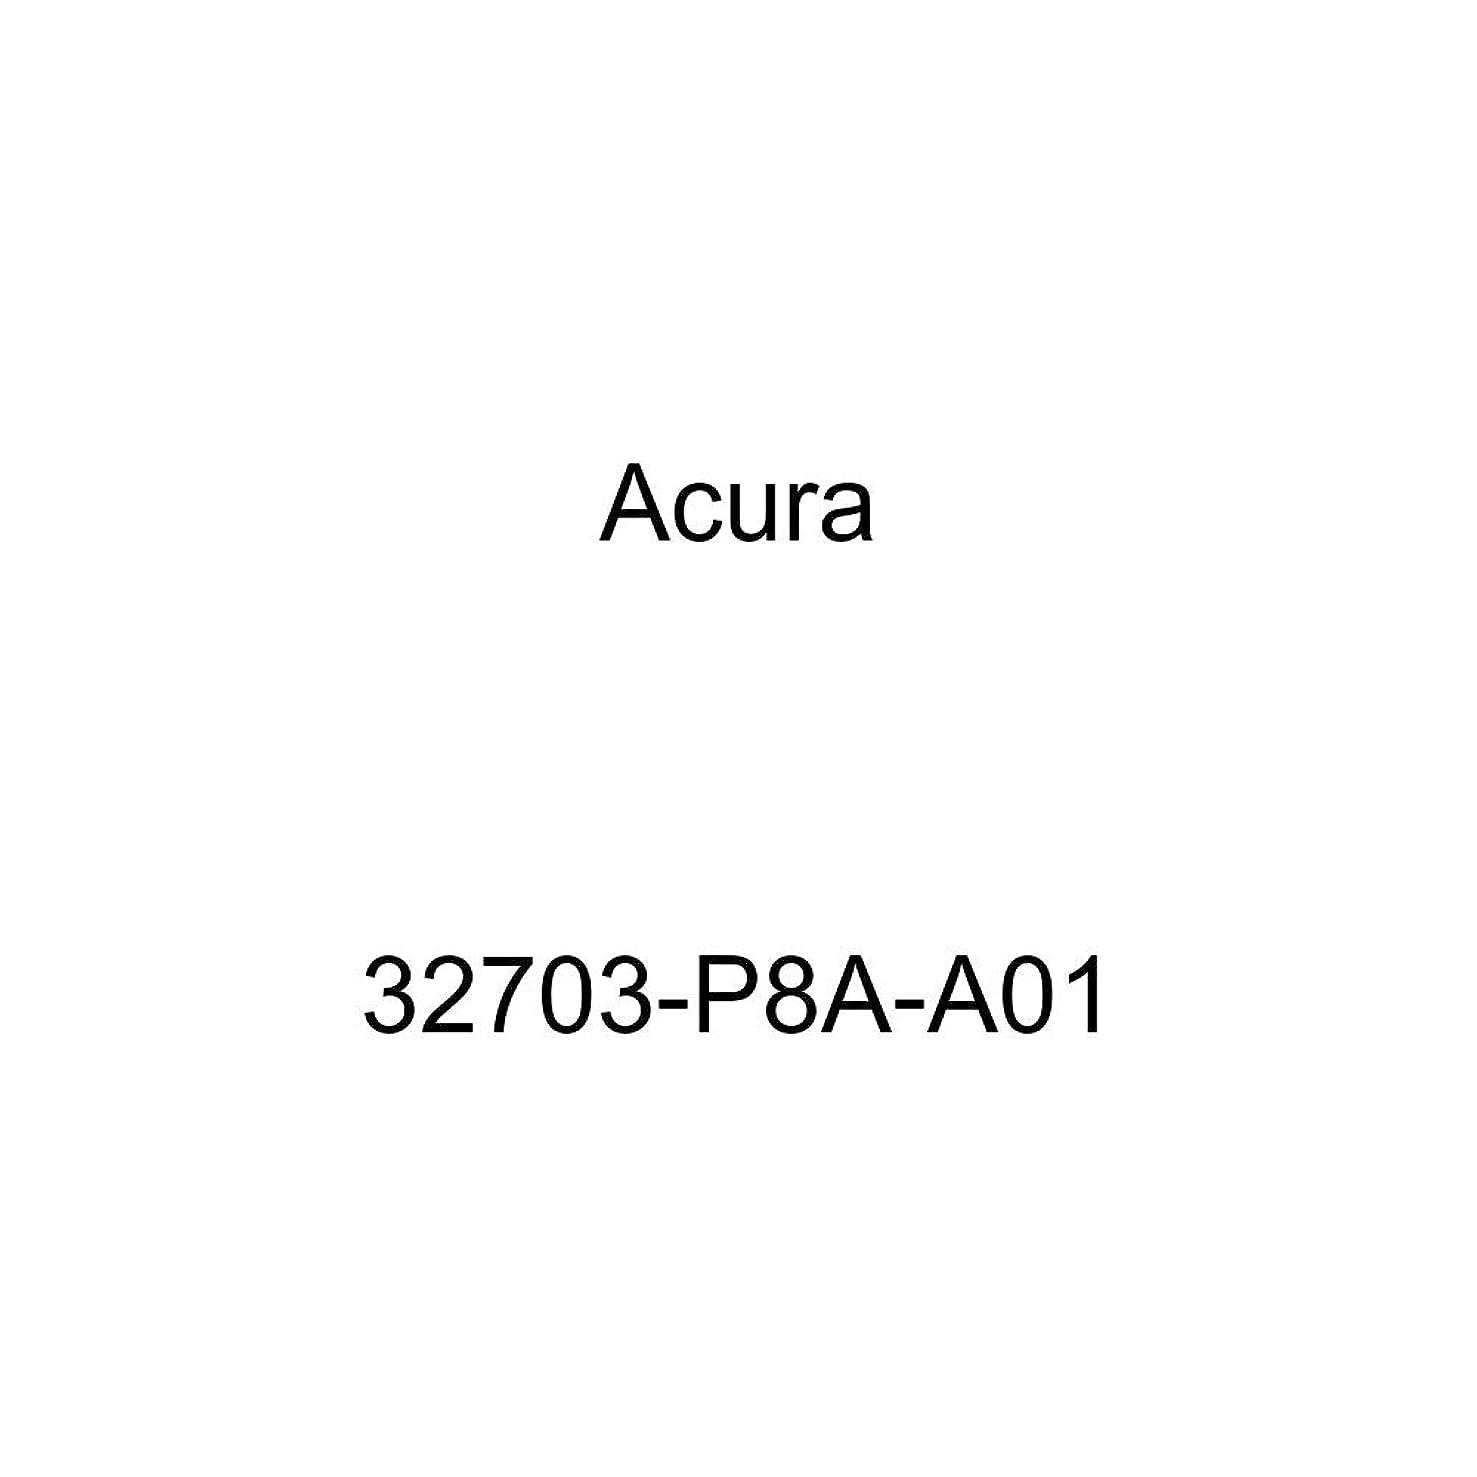 Acura 32703-P8A-A01 Spark Plug Wire